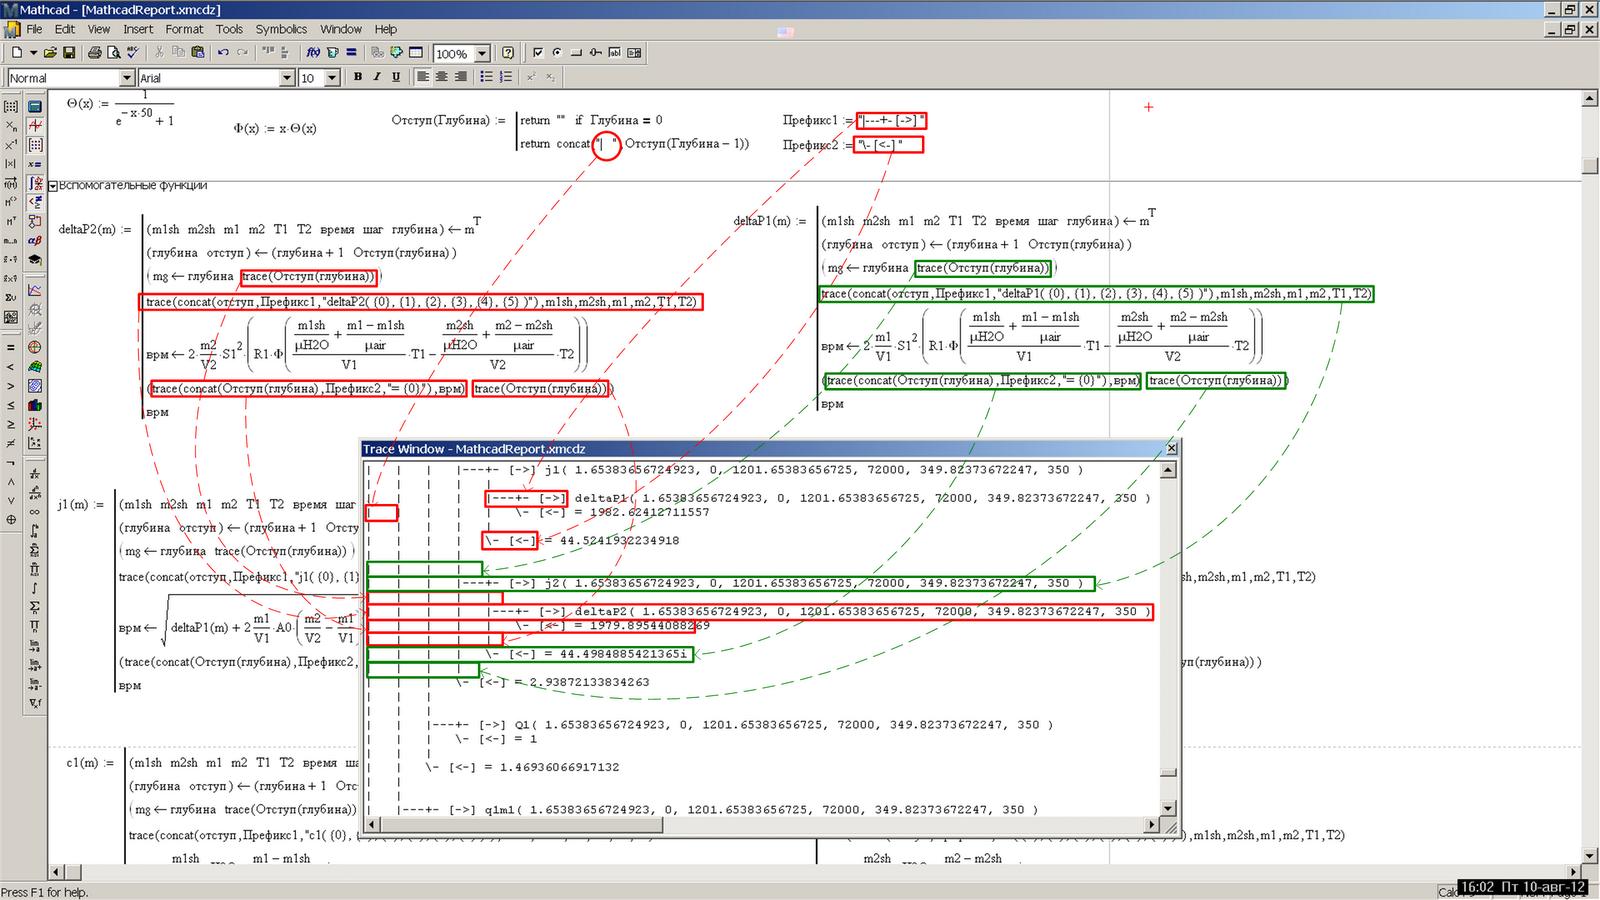 MathcadReportGraph.png